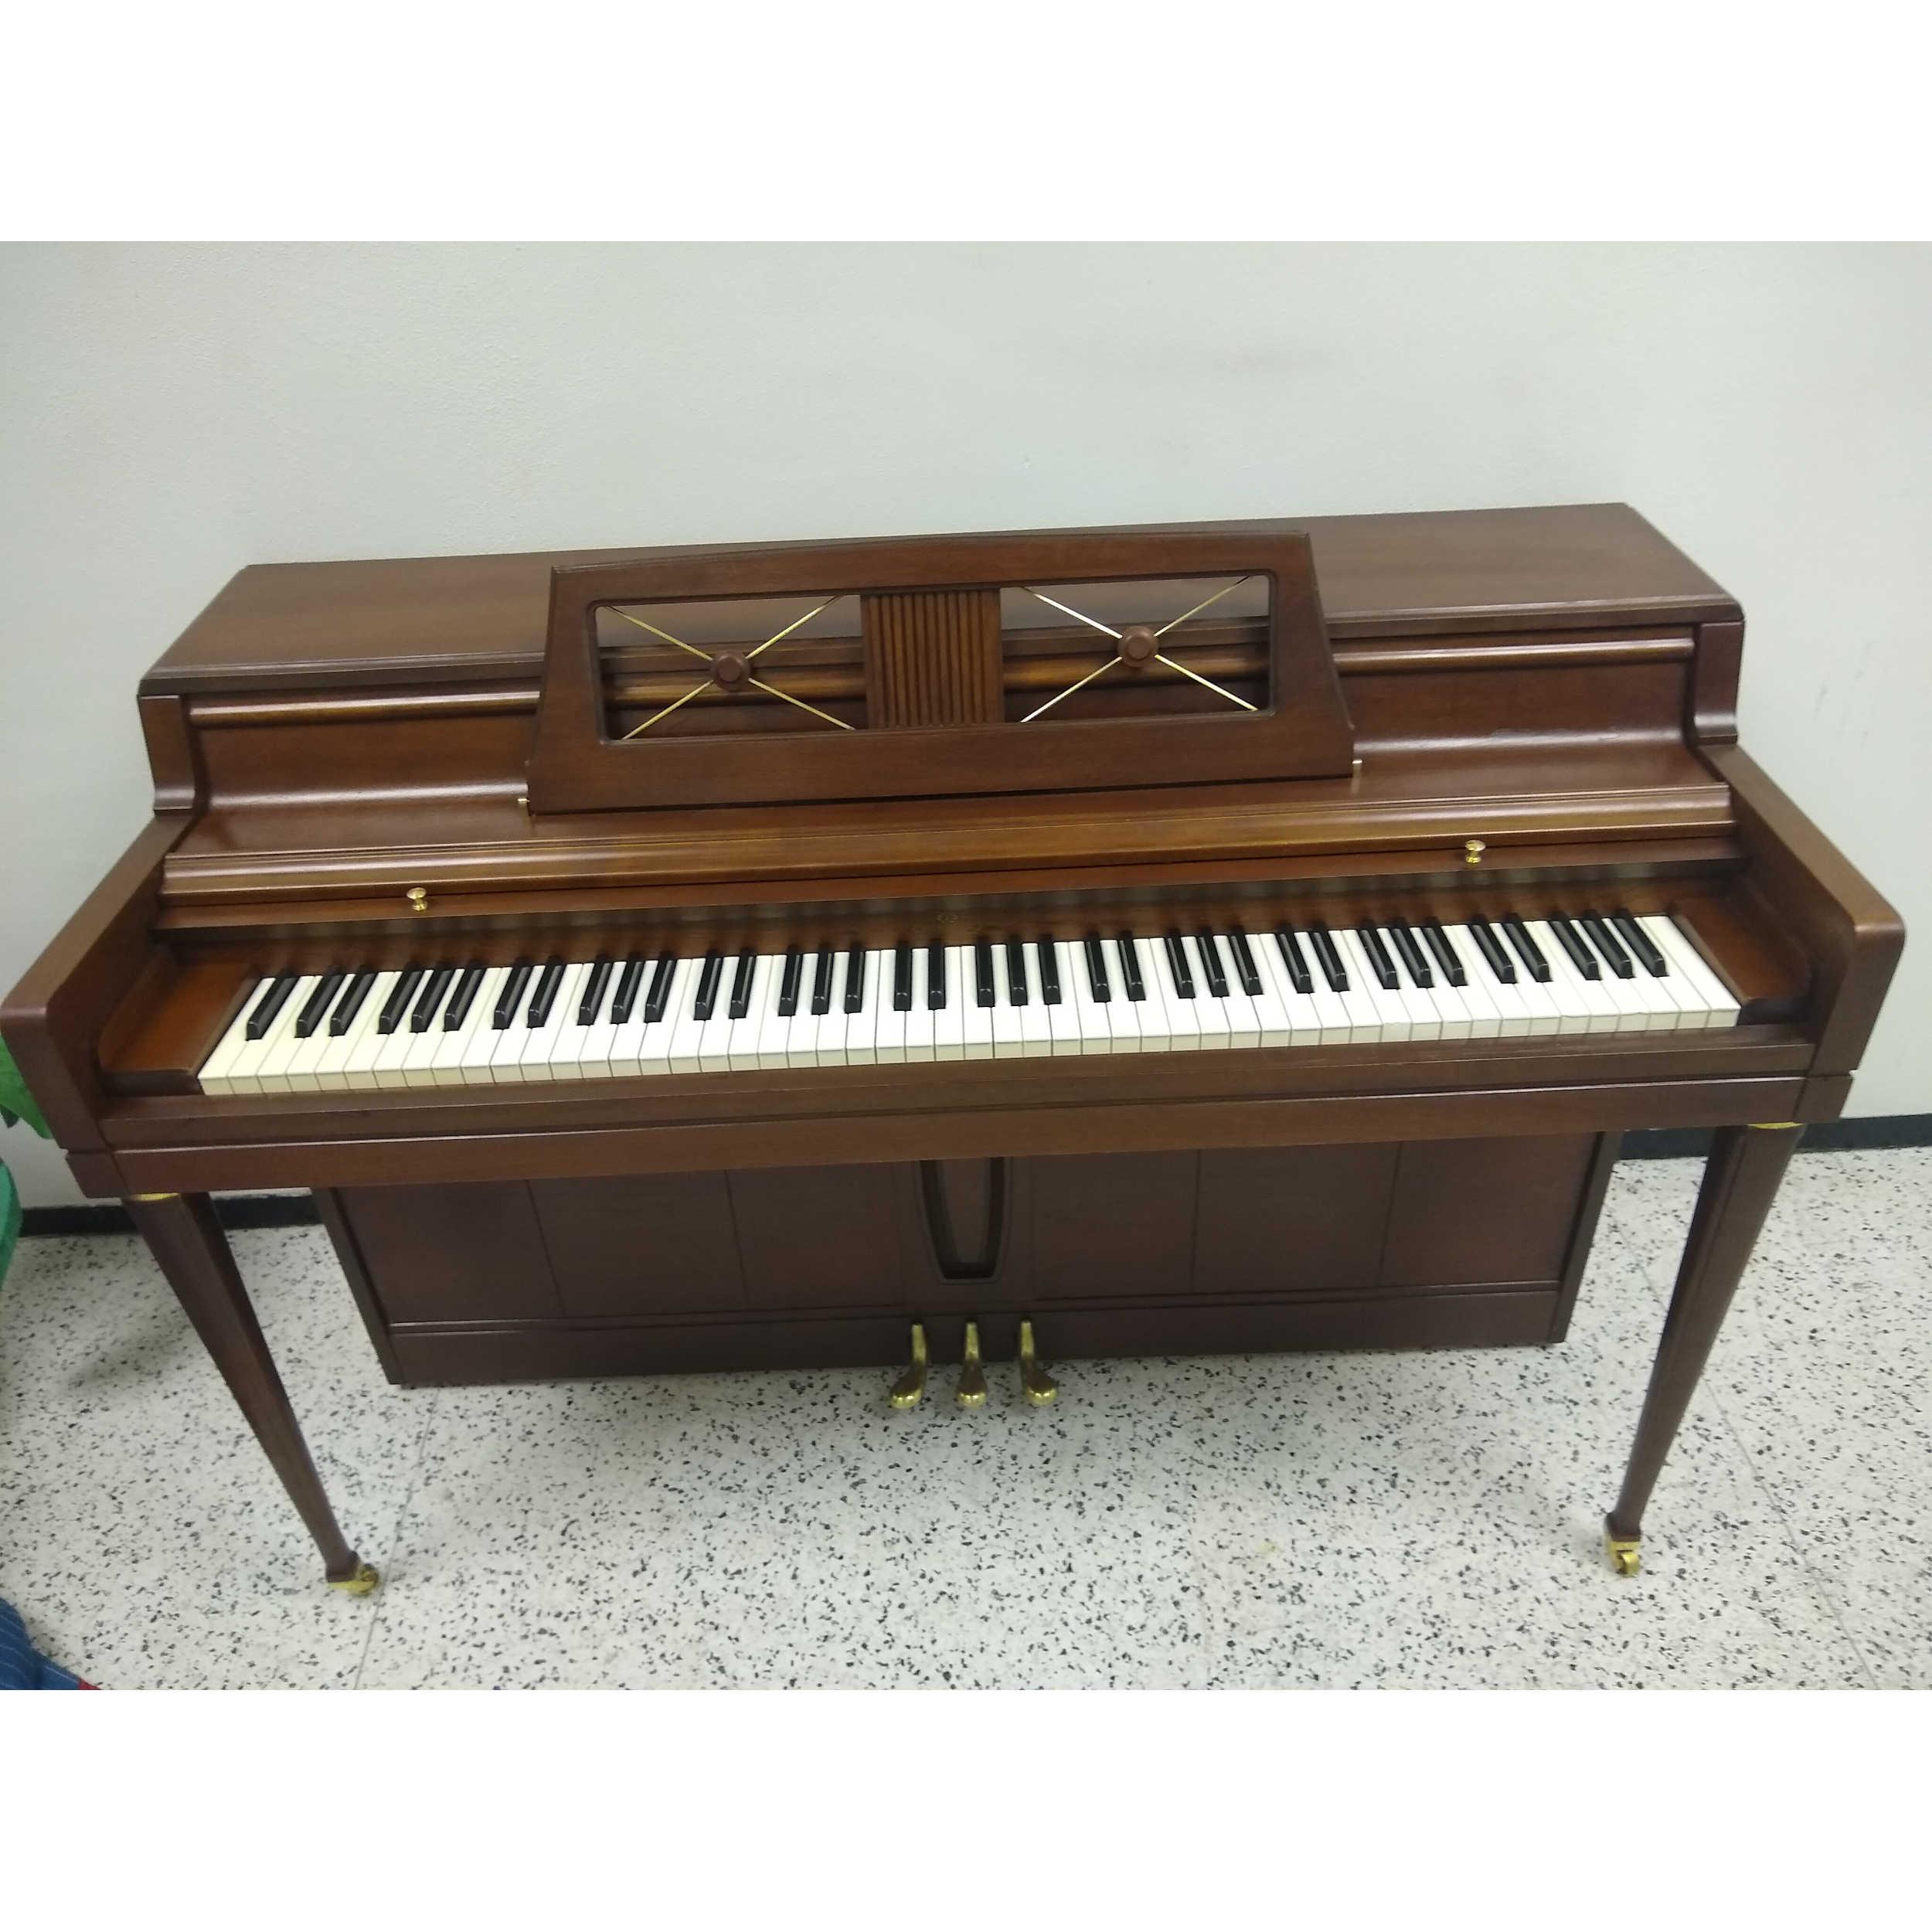 Wurlitzer Designer Piano Walnut Finish